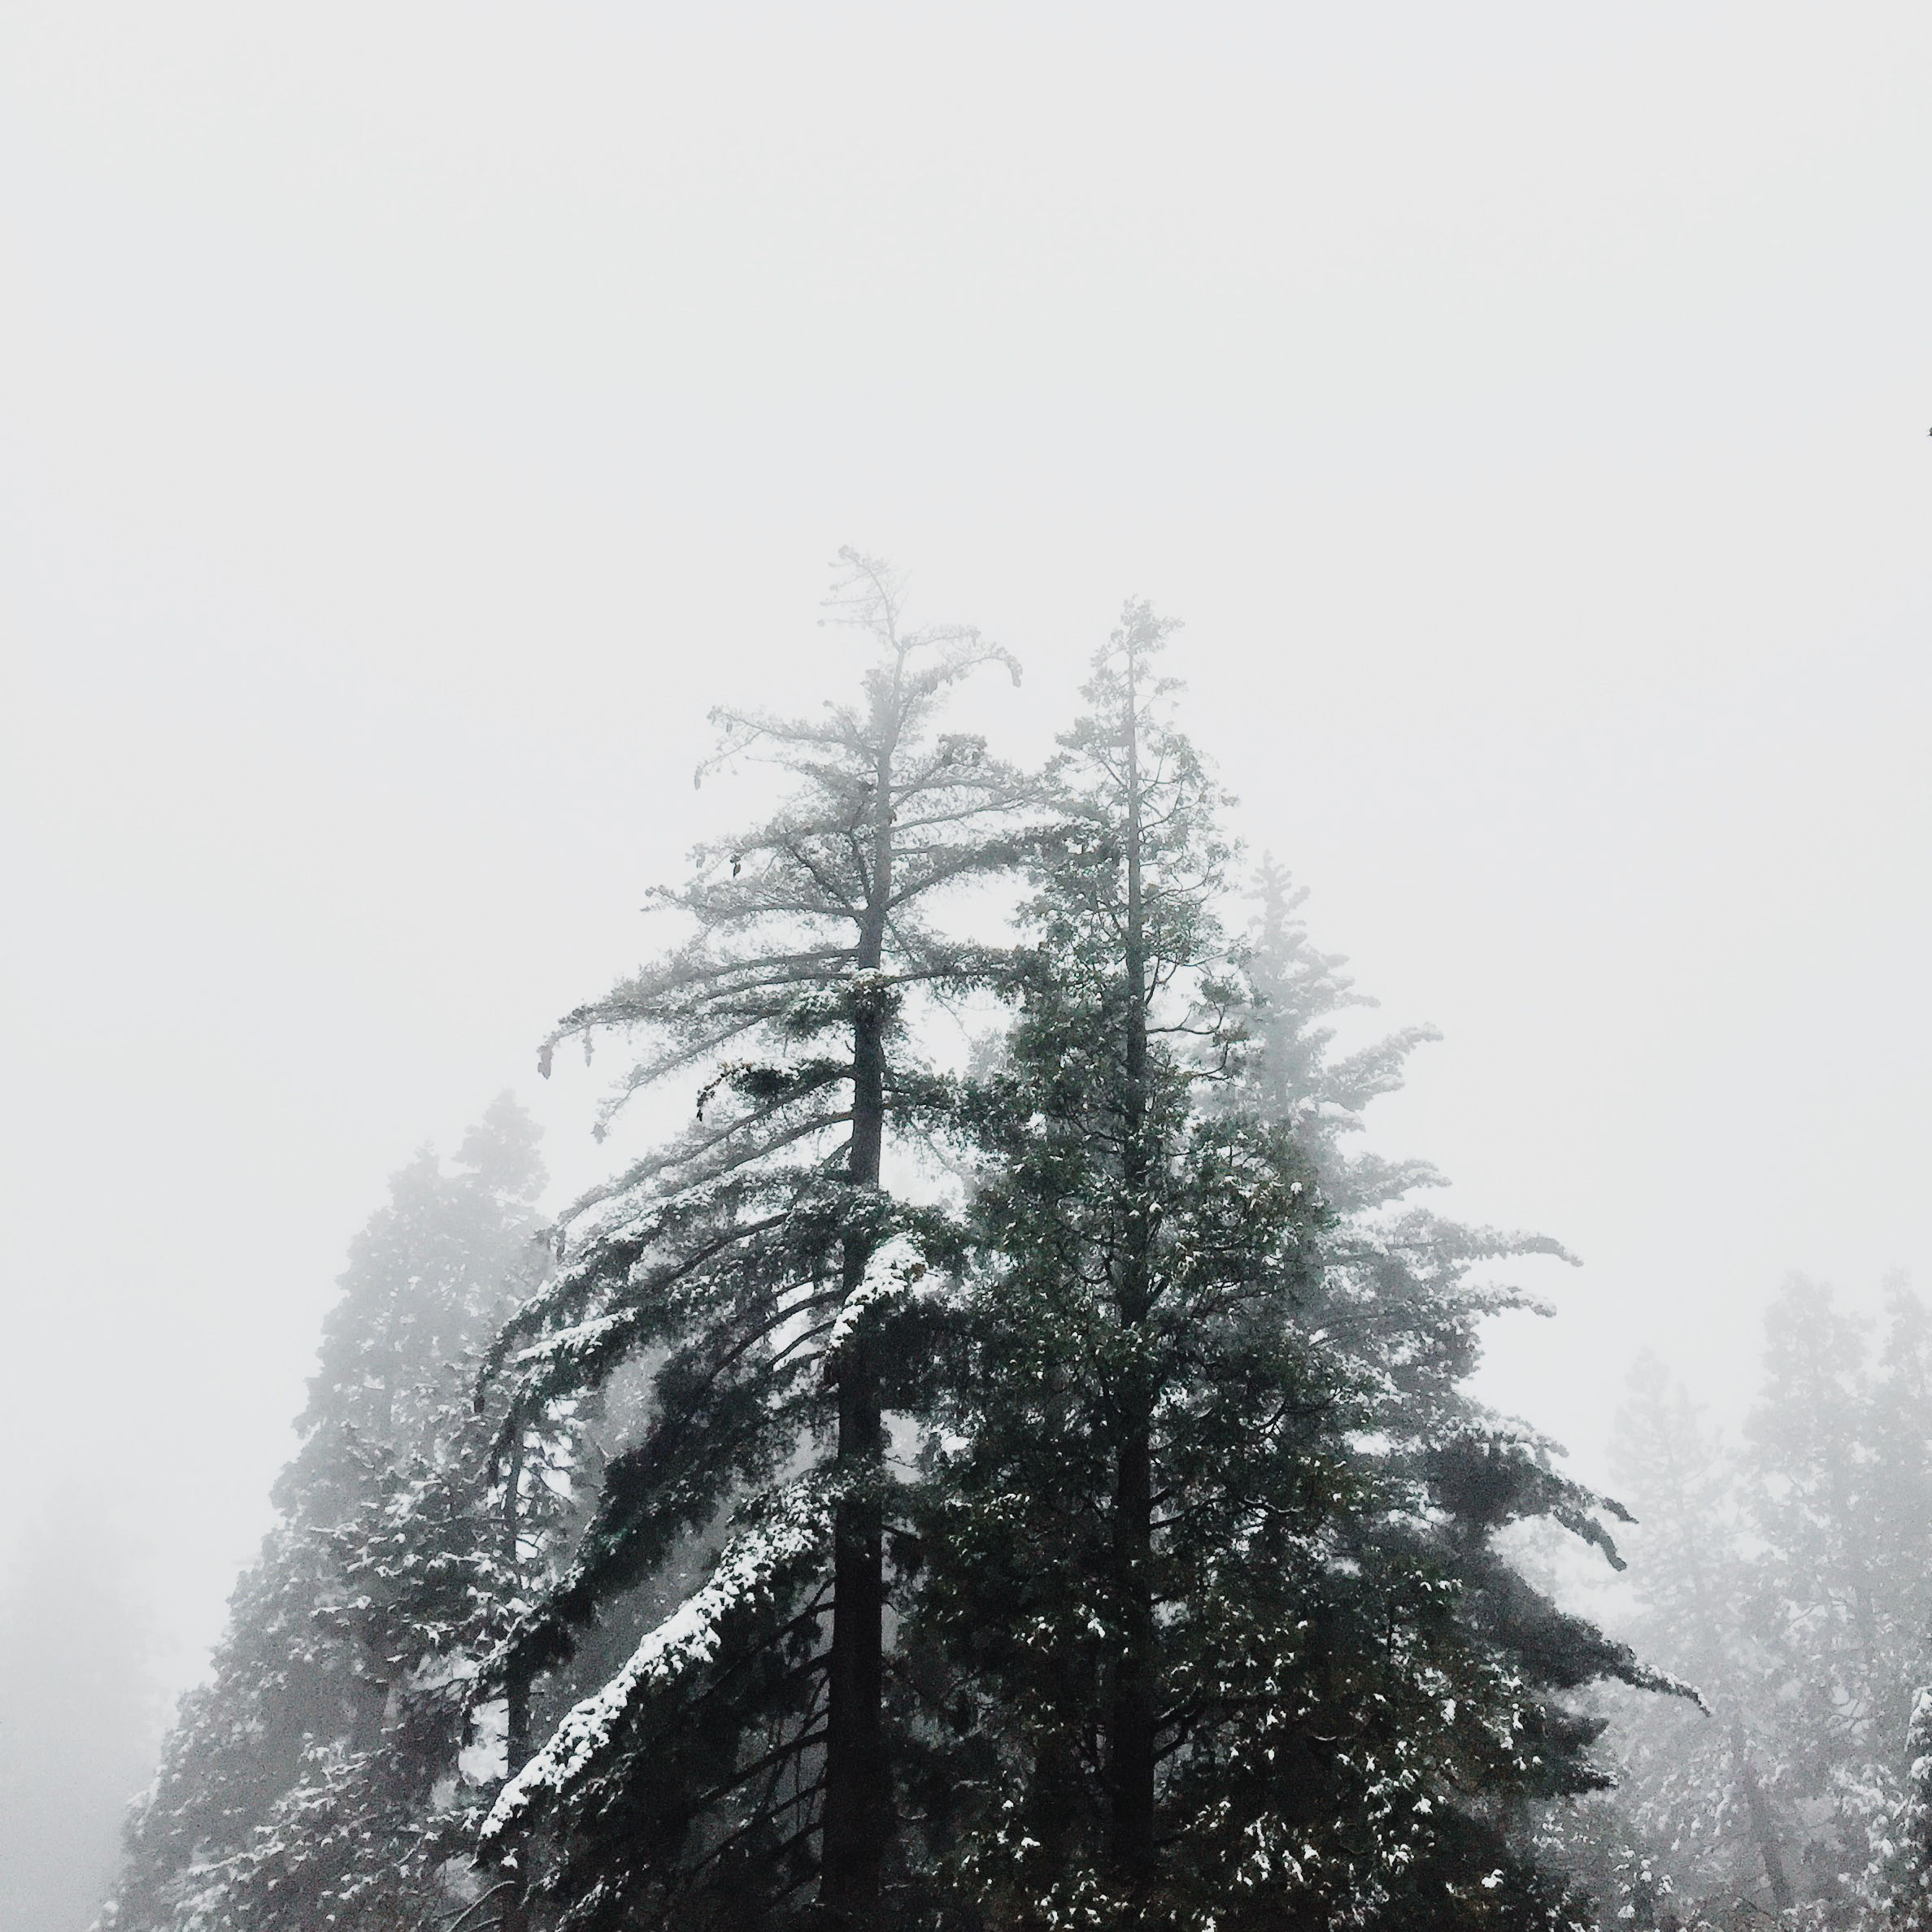 Snowy pine trees | Katch Silva